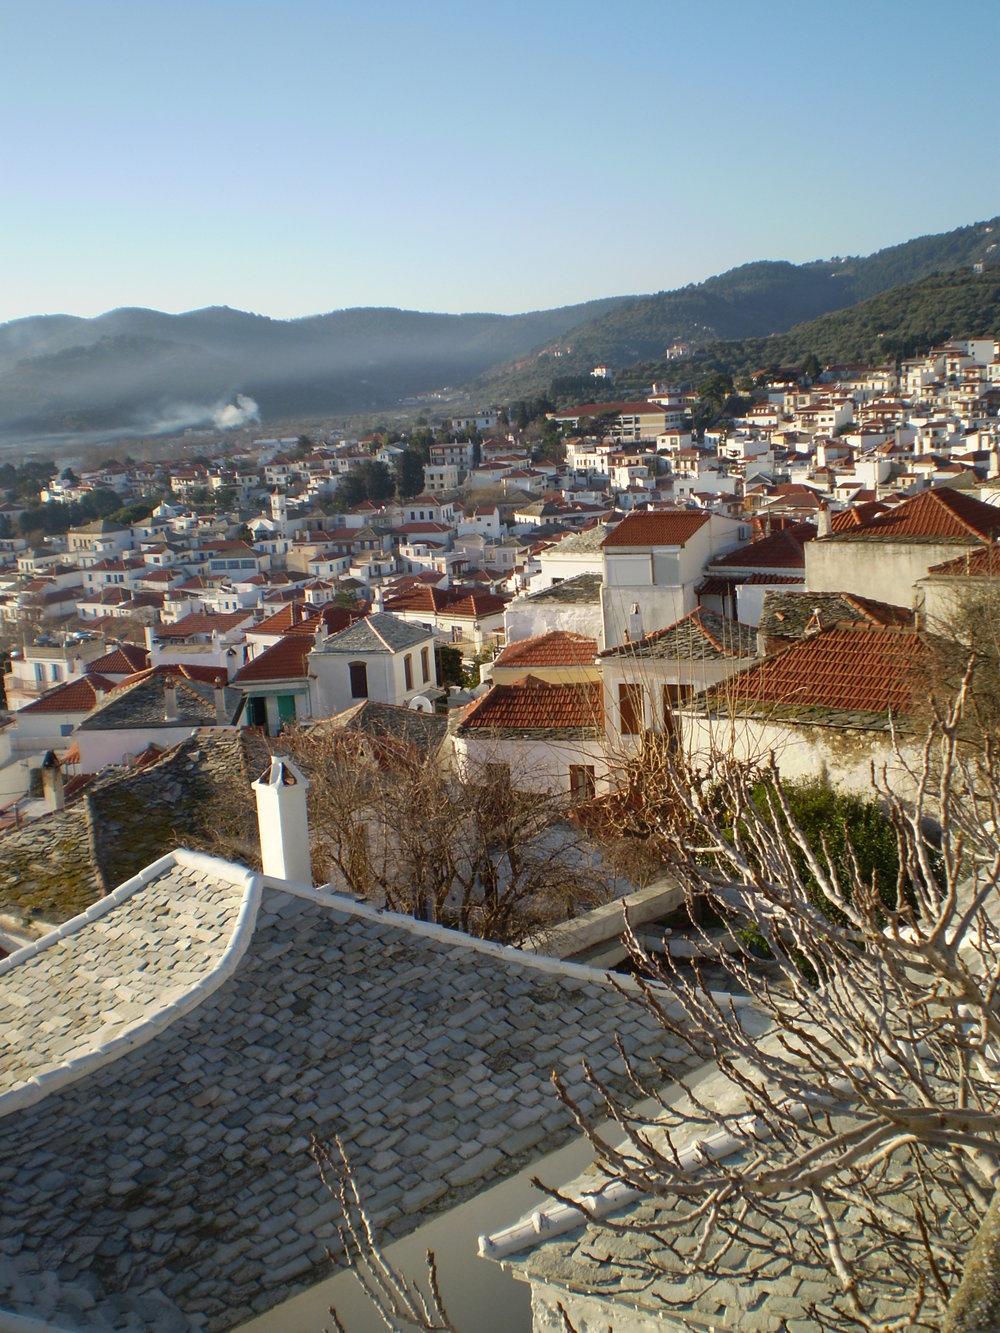 Skopelos town houses